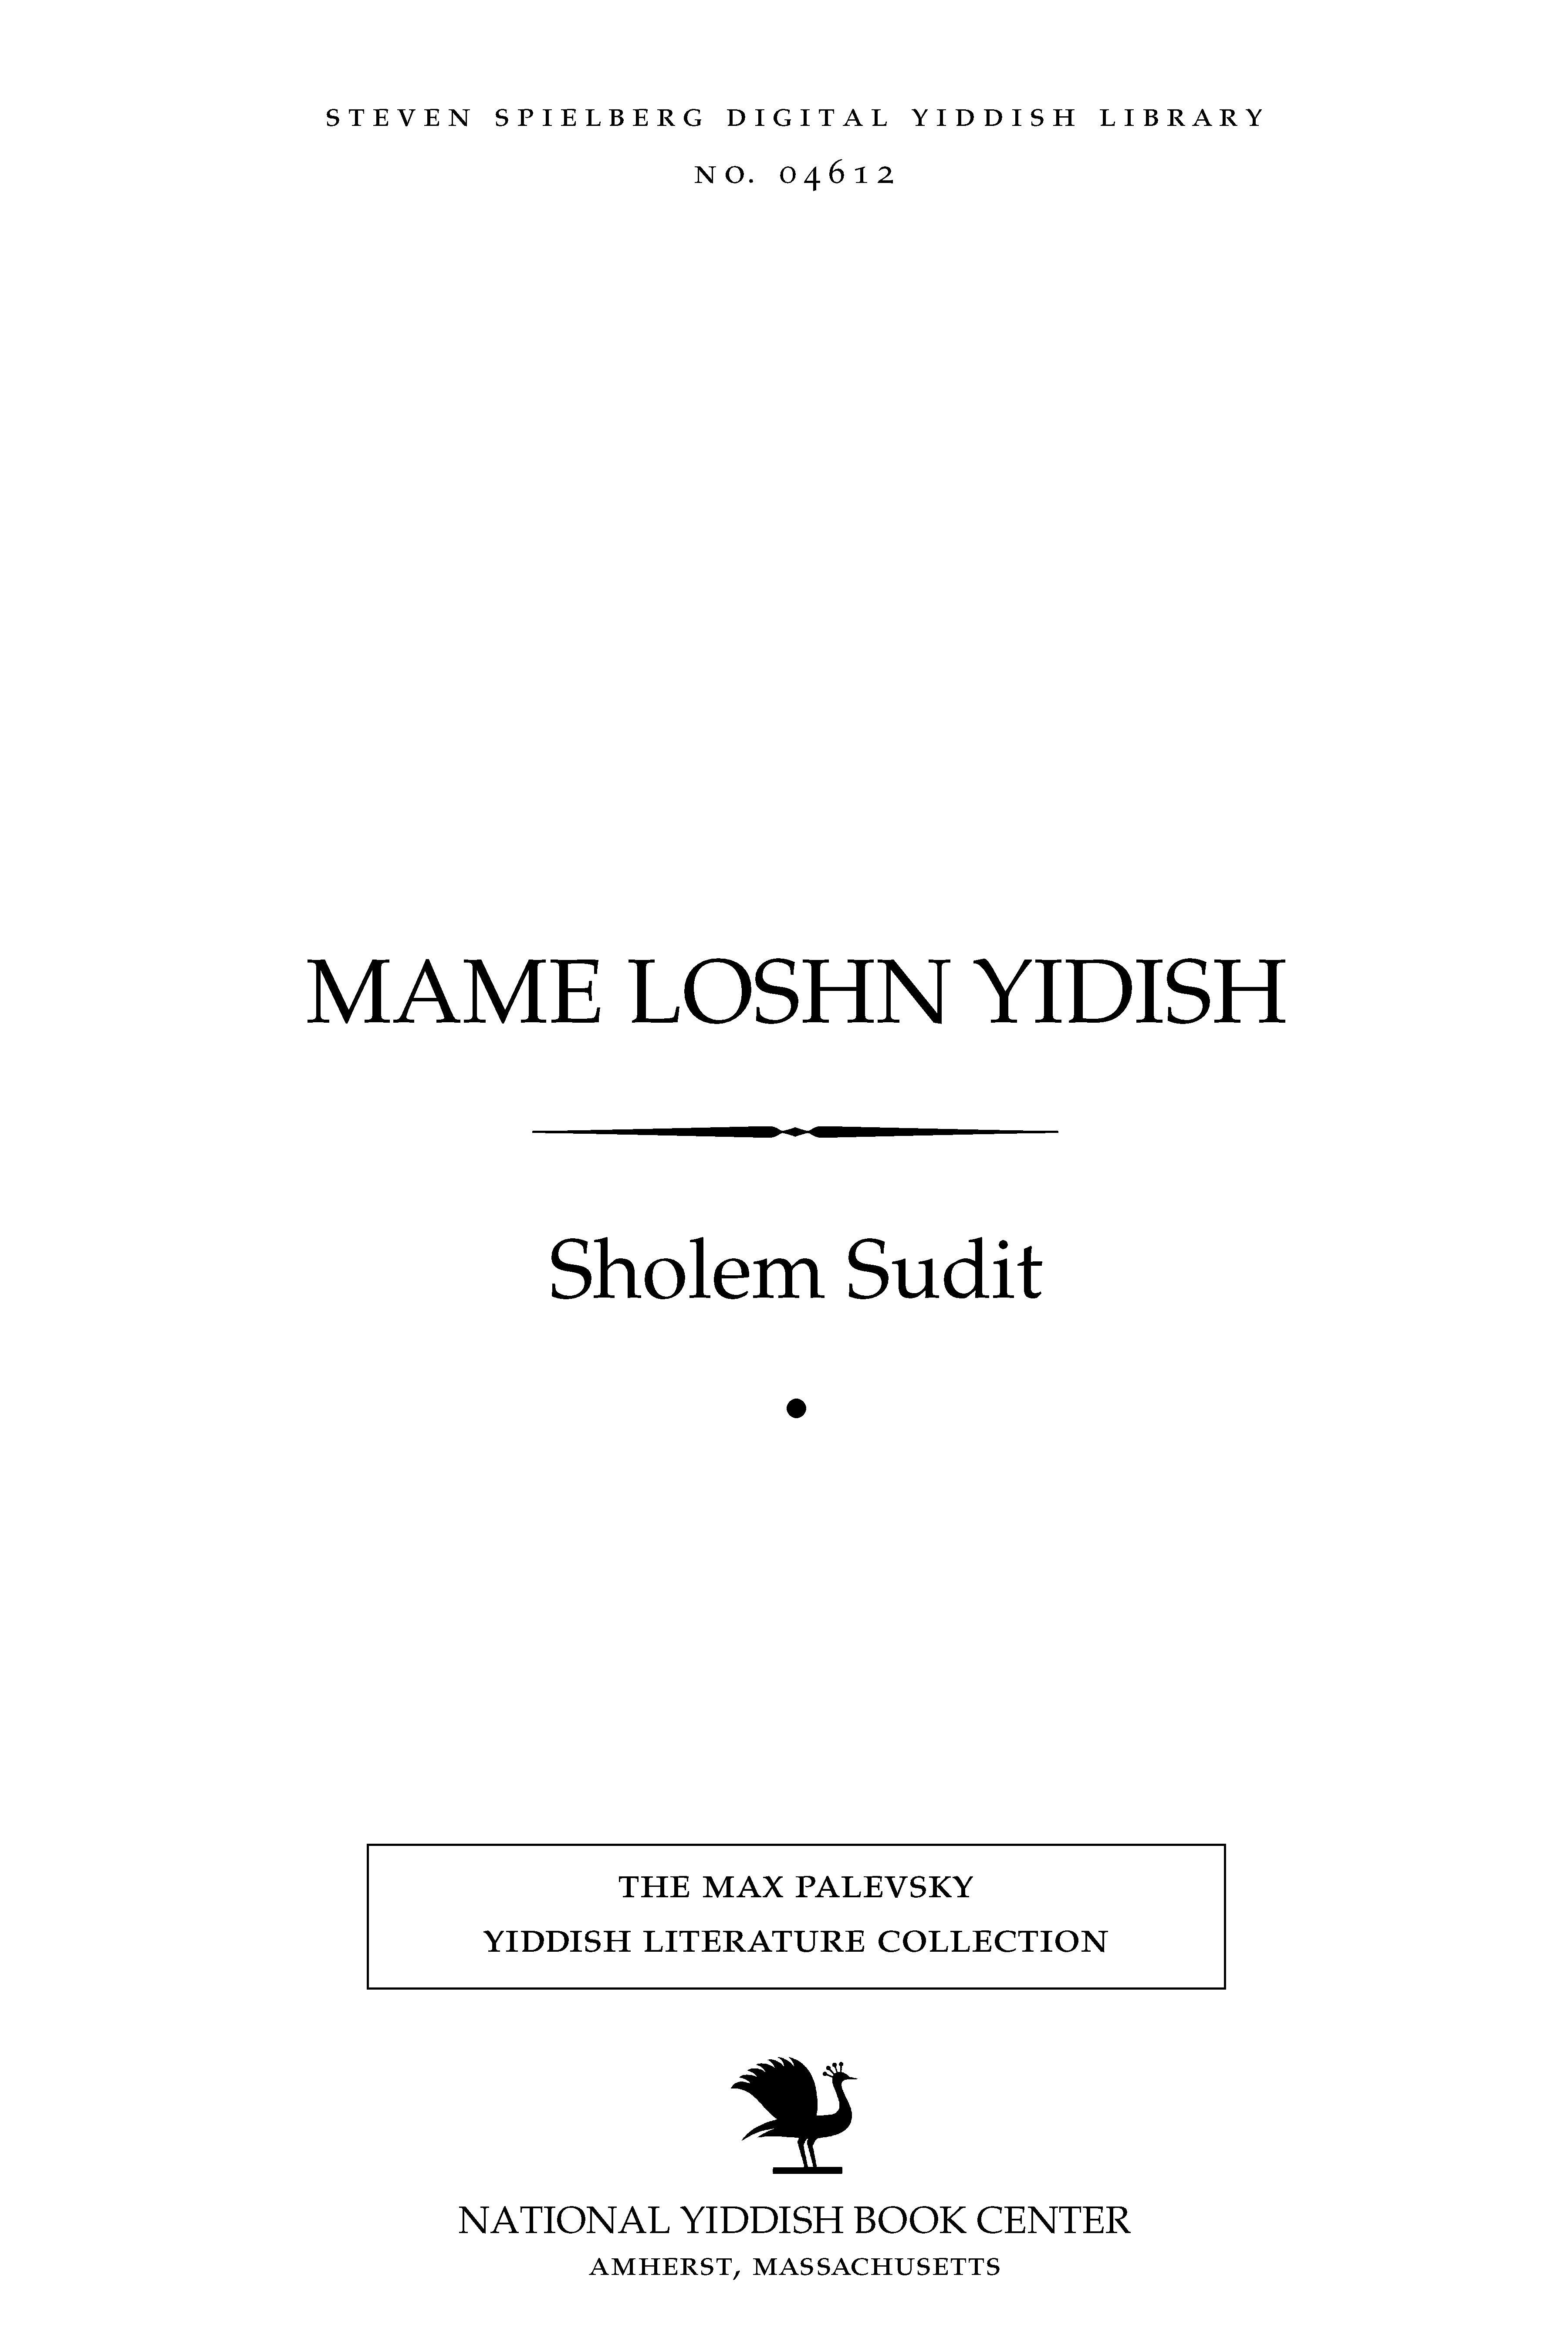 Cover of: Mame loshn Yidish- | Sholem Sudit